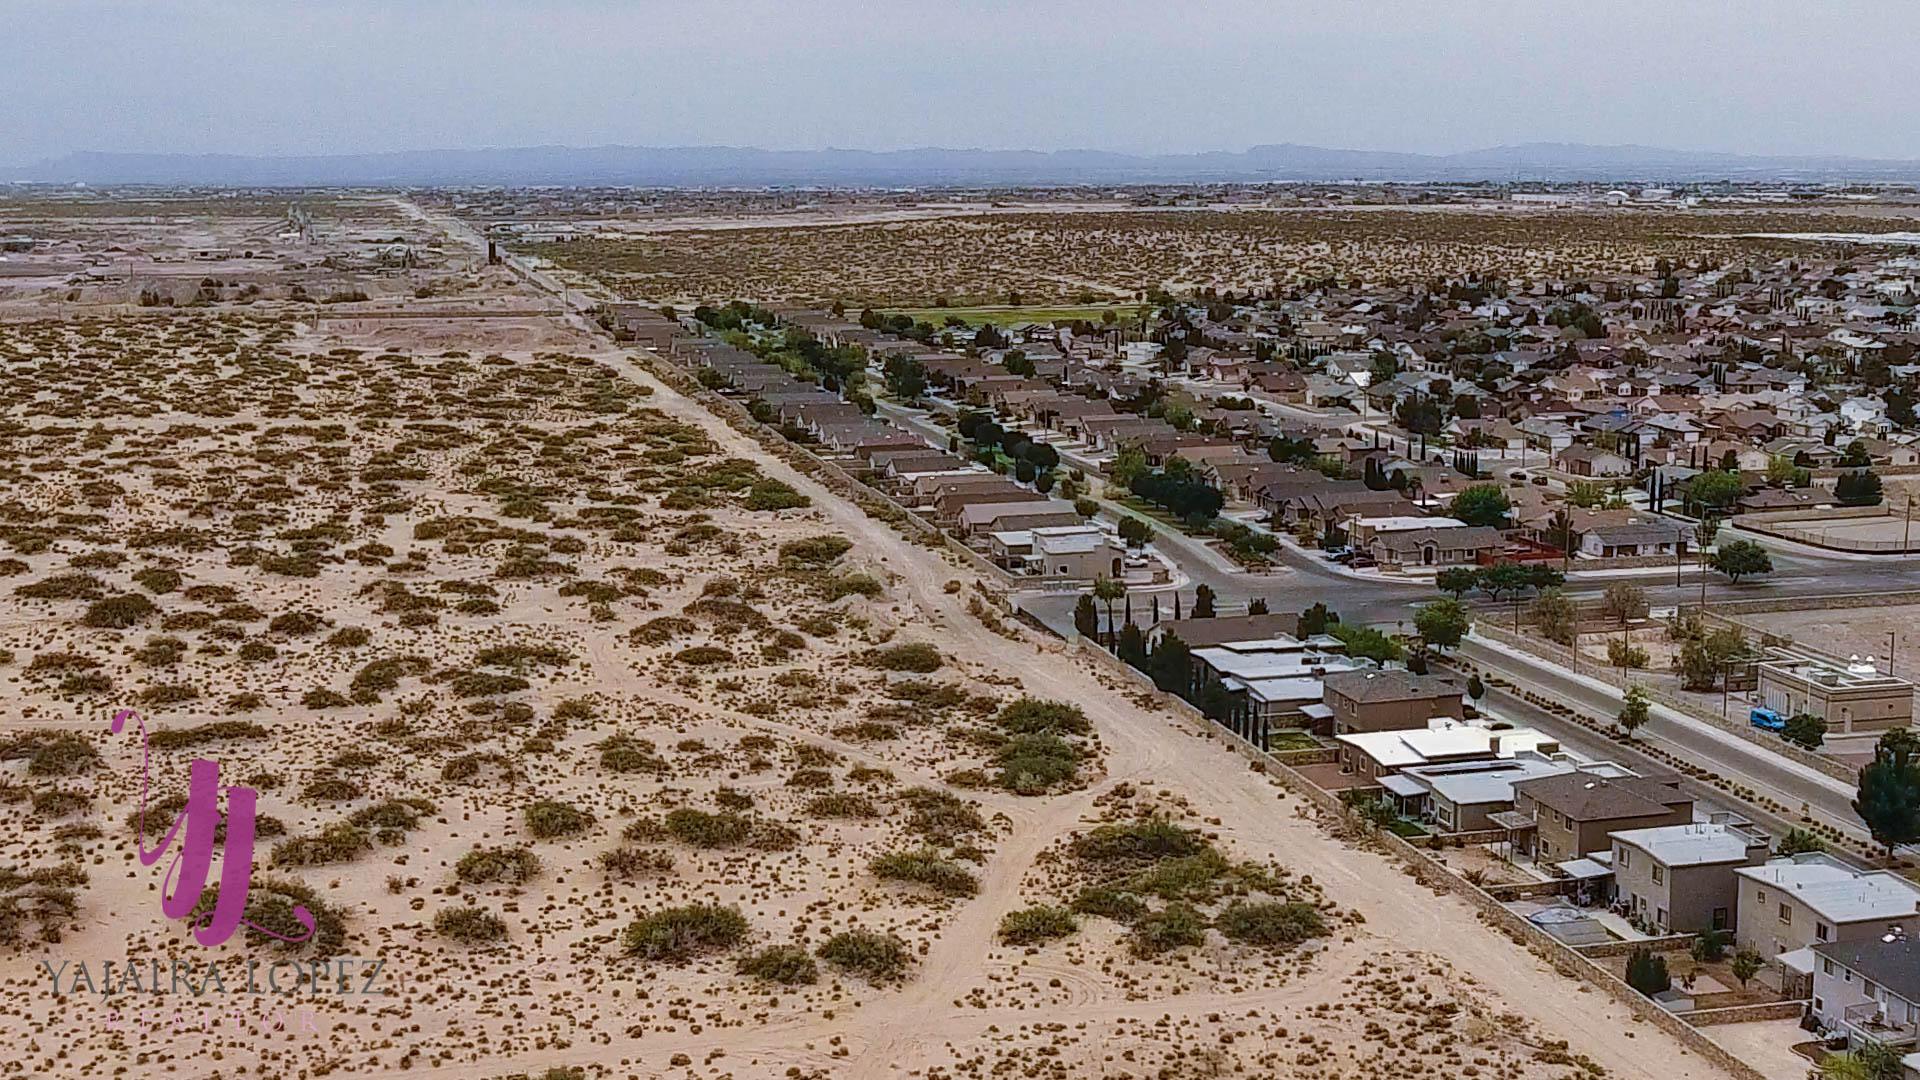 5 AC Cozy Cove Avenue, El Paso, Texas 79938, ,Land,For sale,Cozy Cove,808069